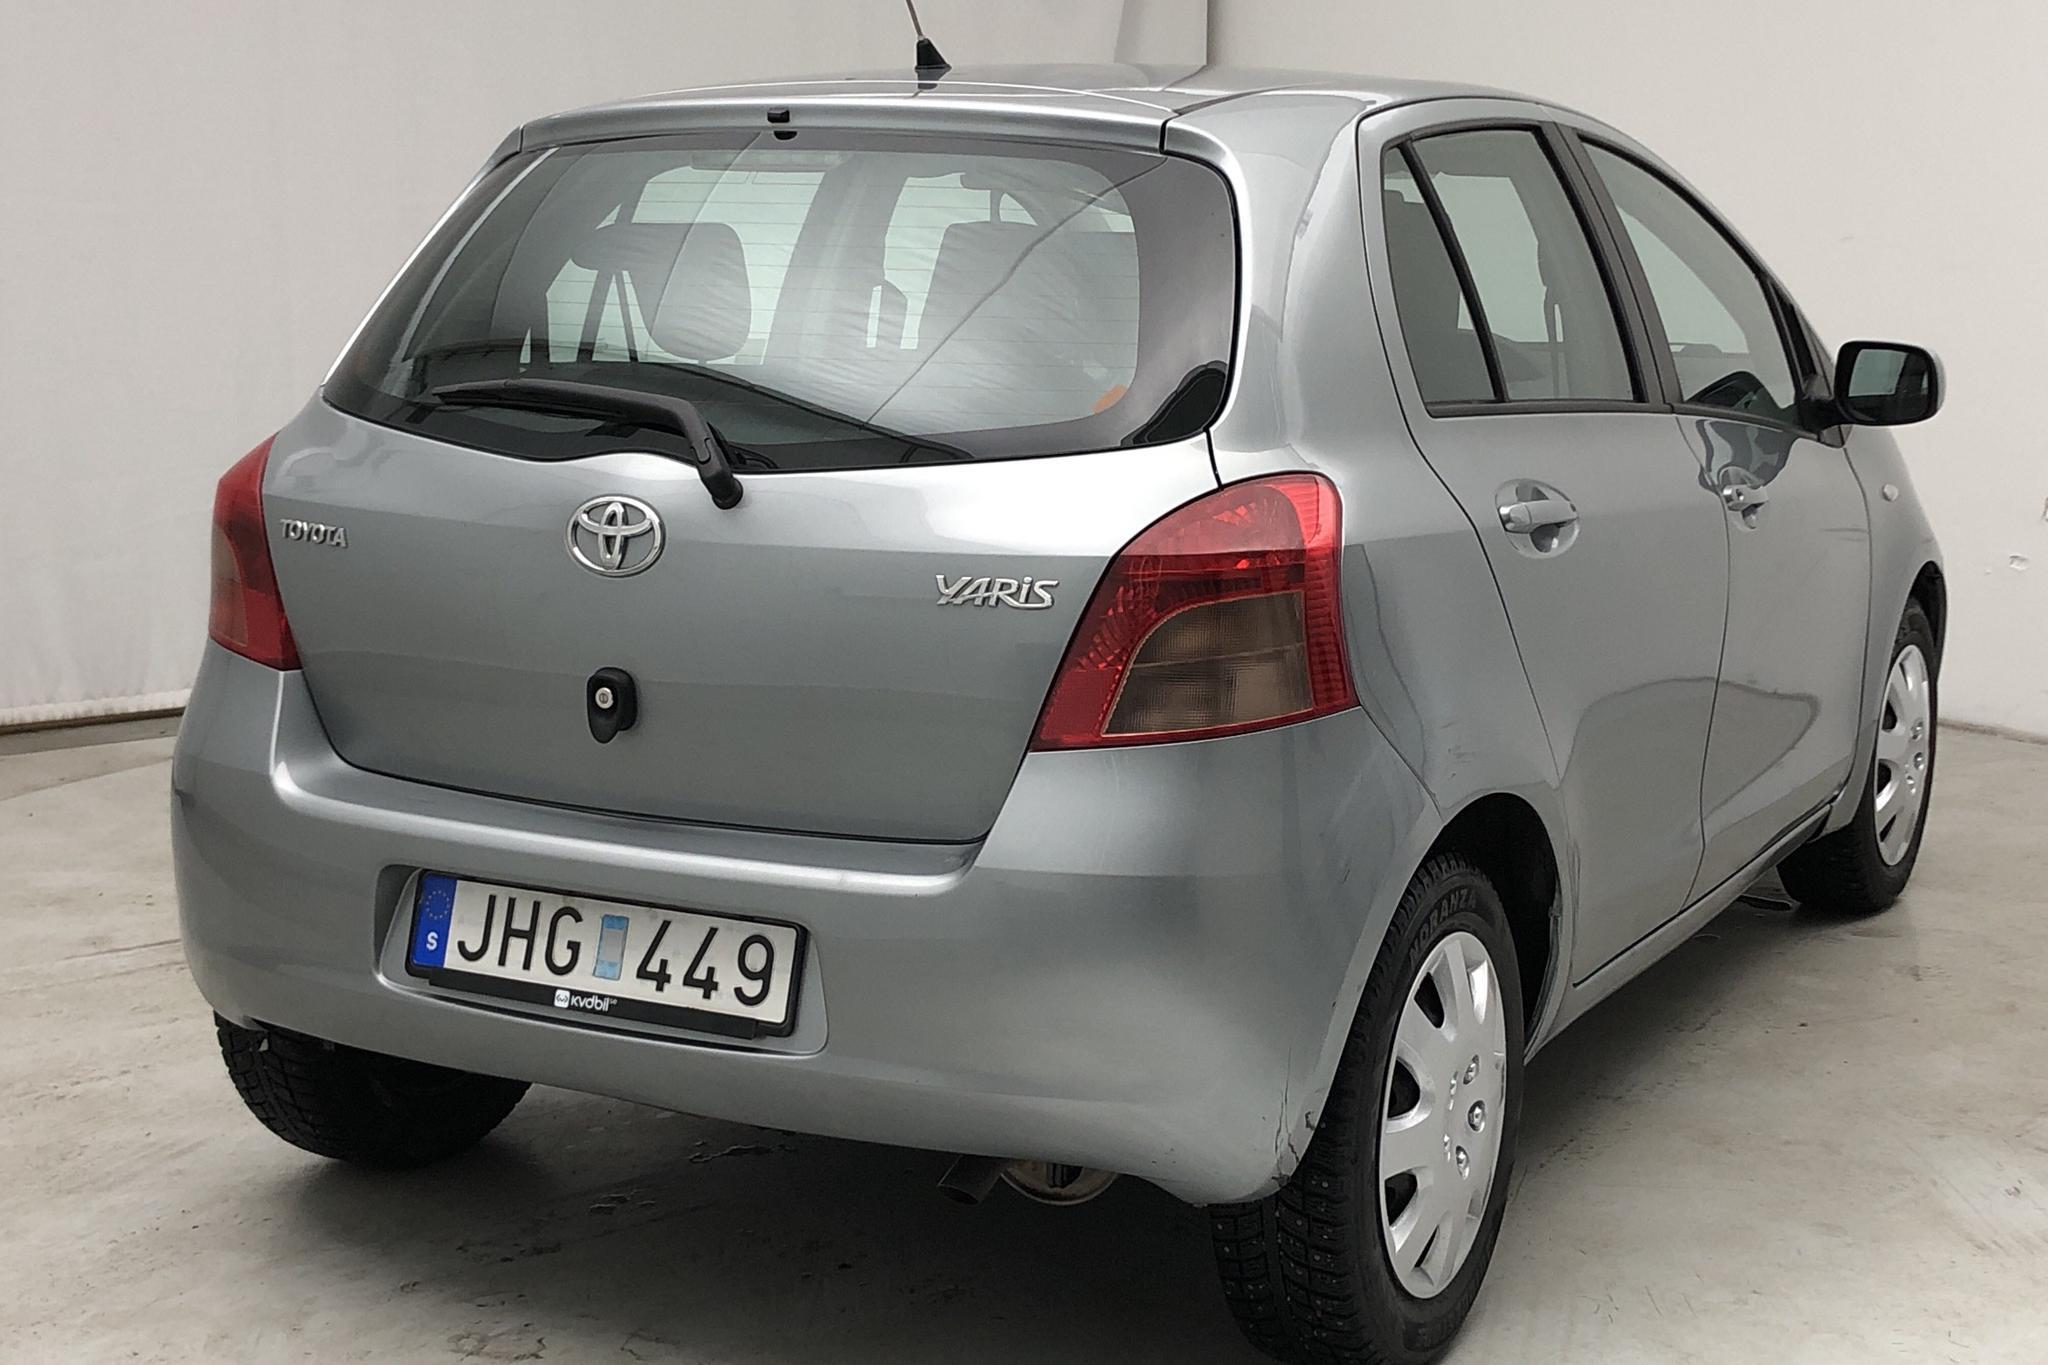 Toyota Yaris 1.3 5dr (87hk) - 54 520 km - Manual - gray - 2006